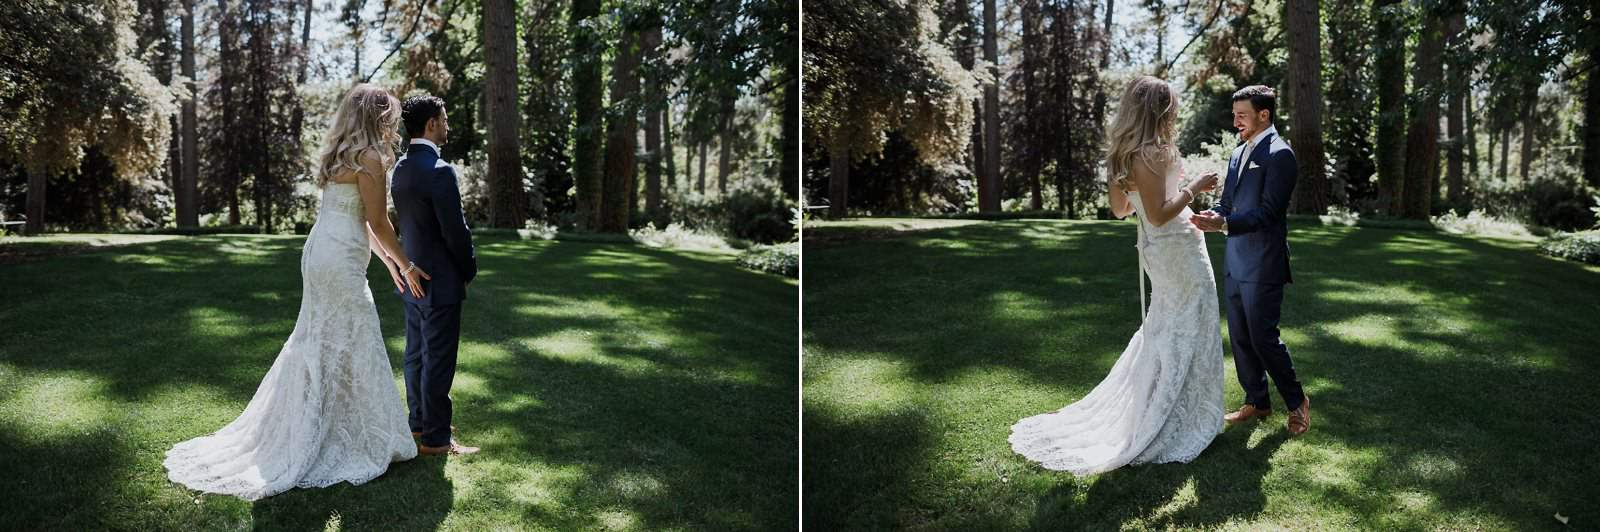 empire-mine-state-historic-park-wedding_0014